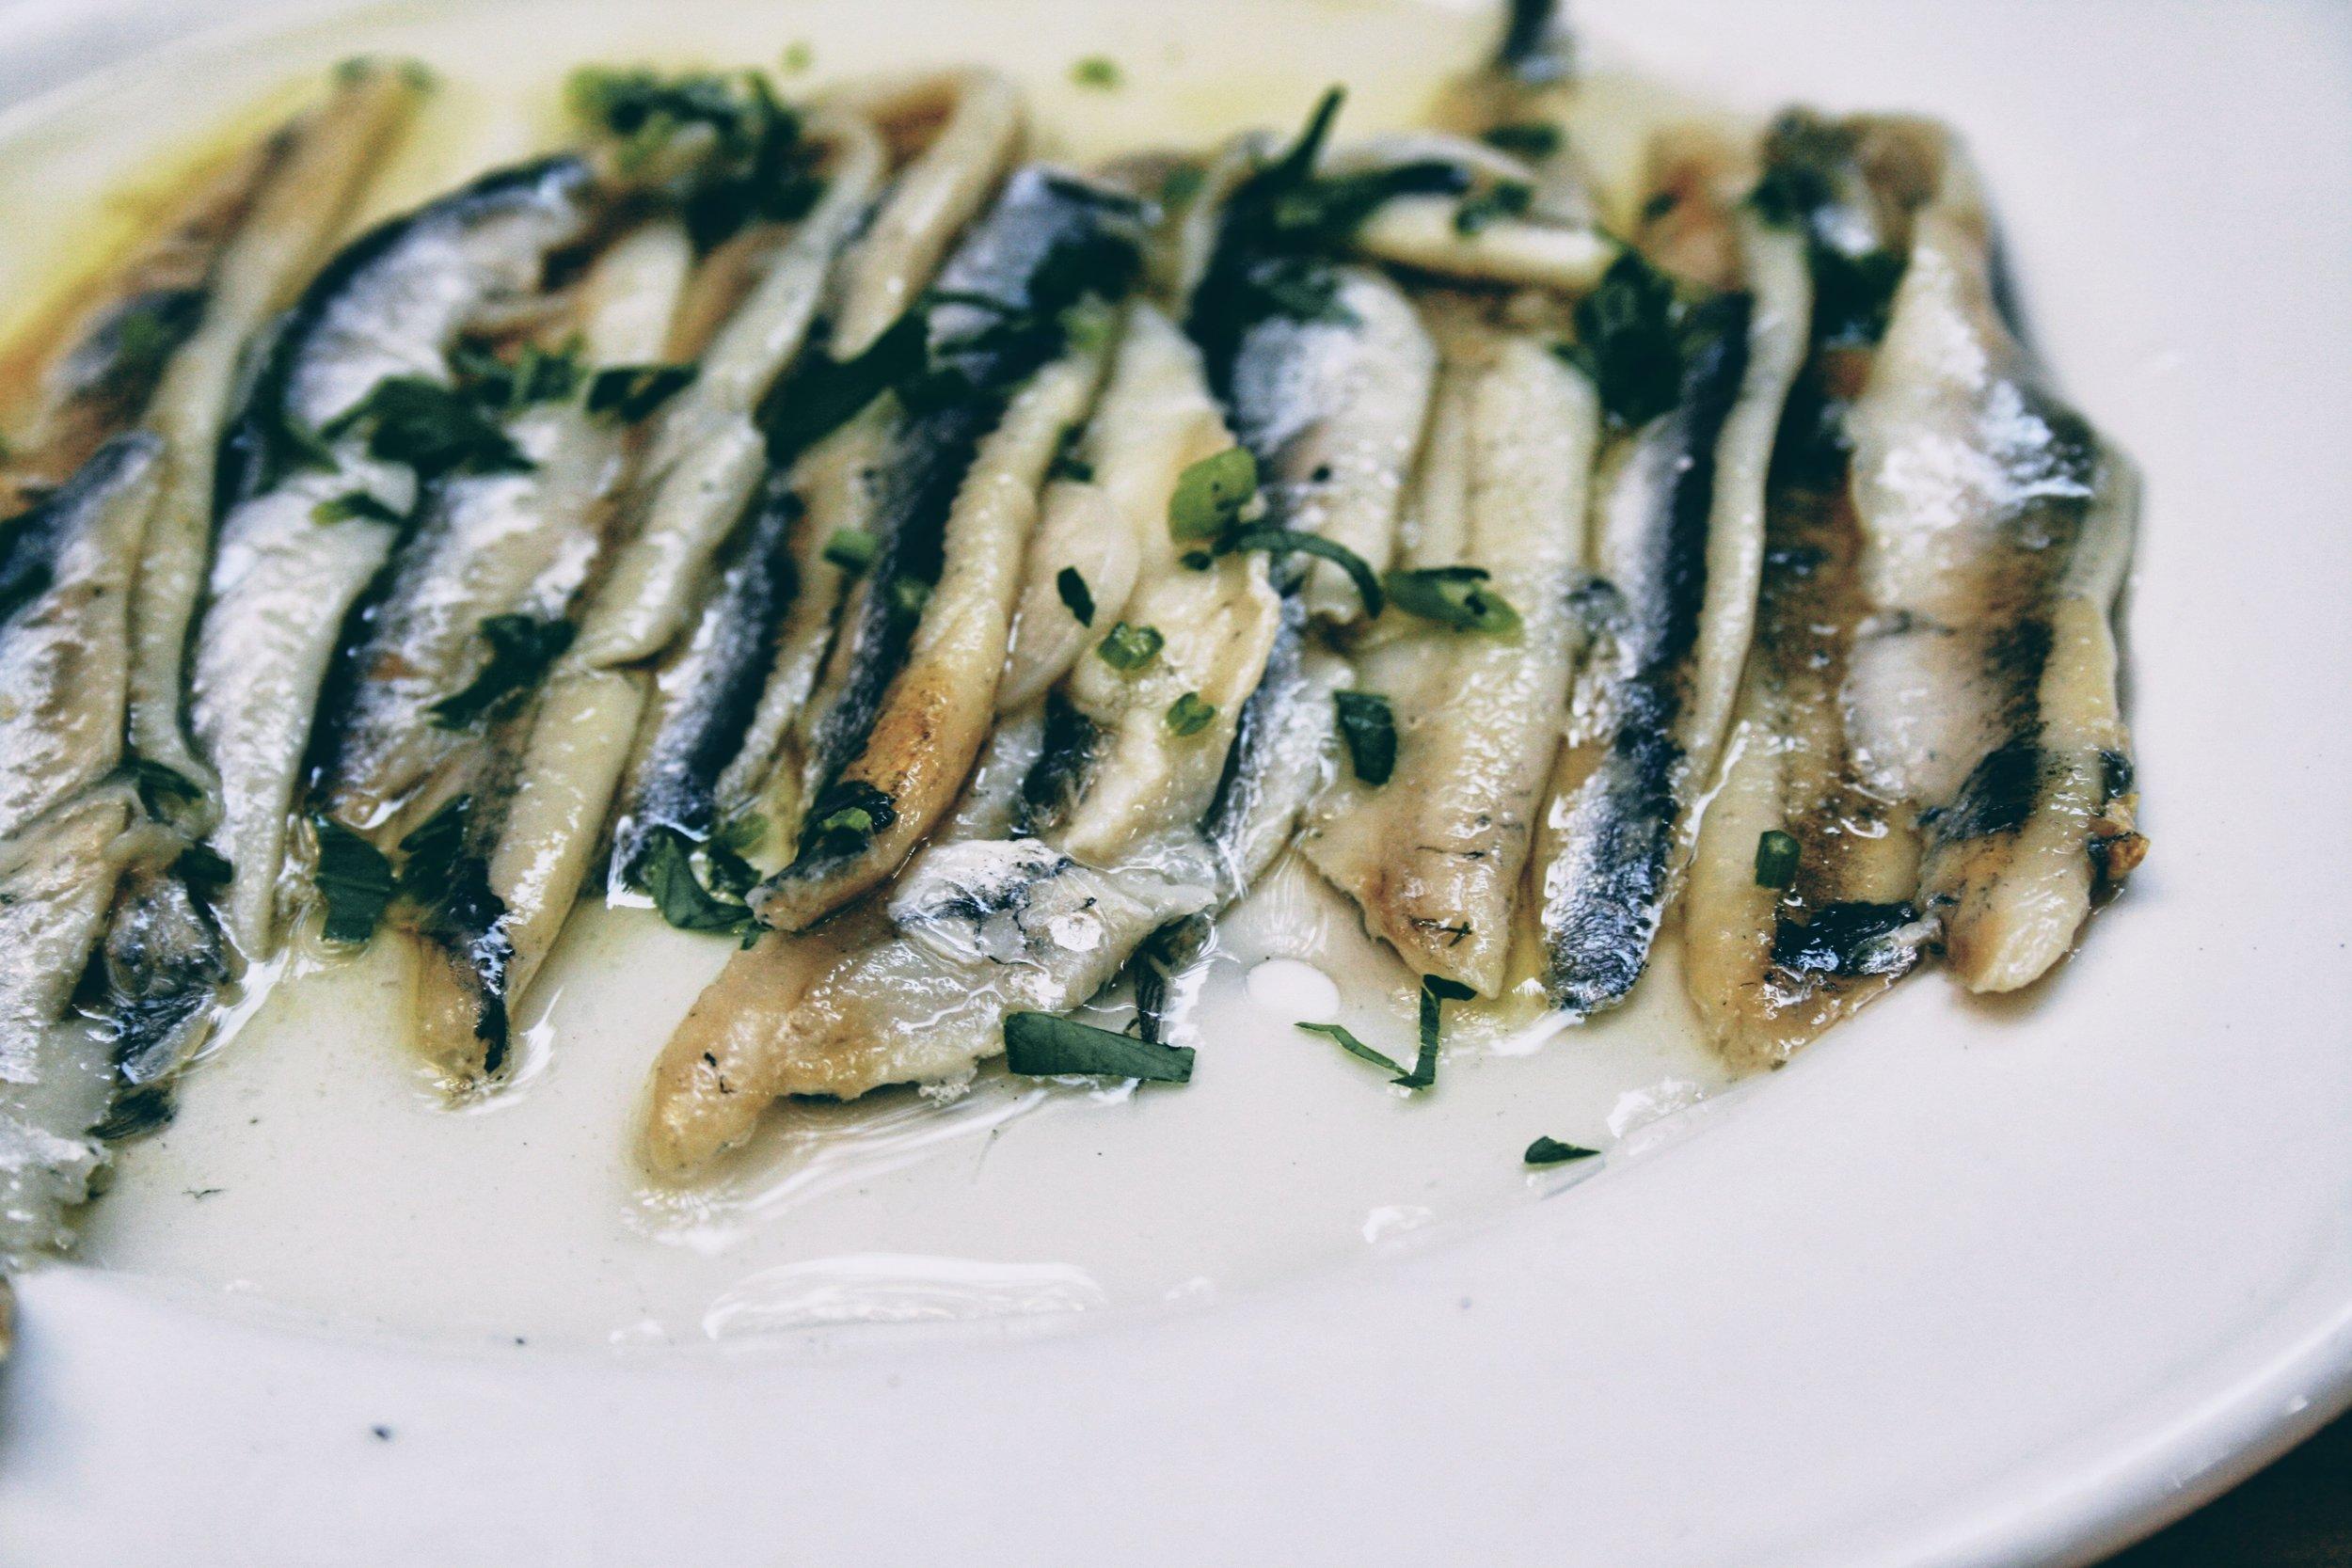 Marinated sardines in extra virgin olive oil